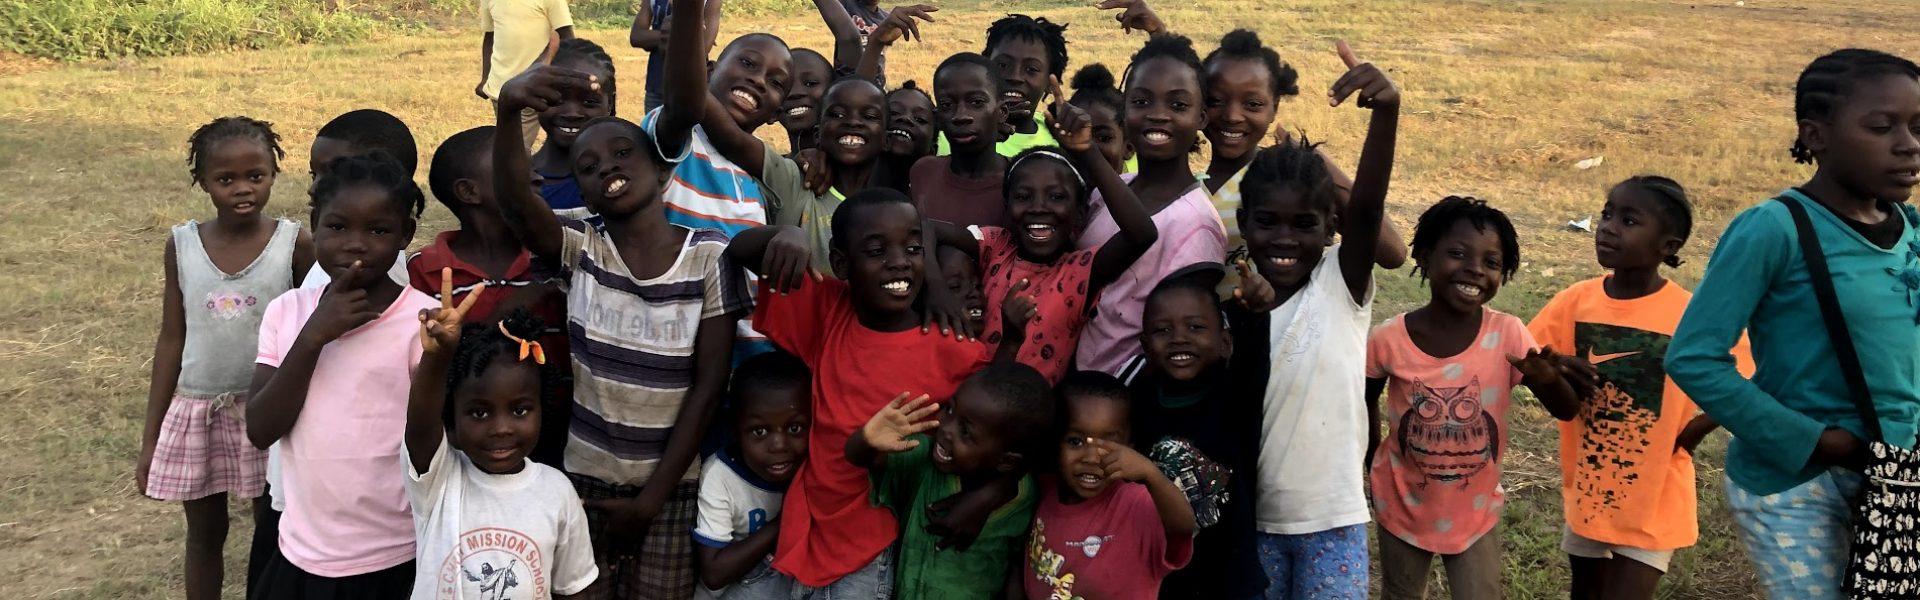 God's Precious Children